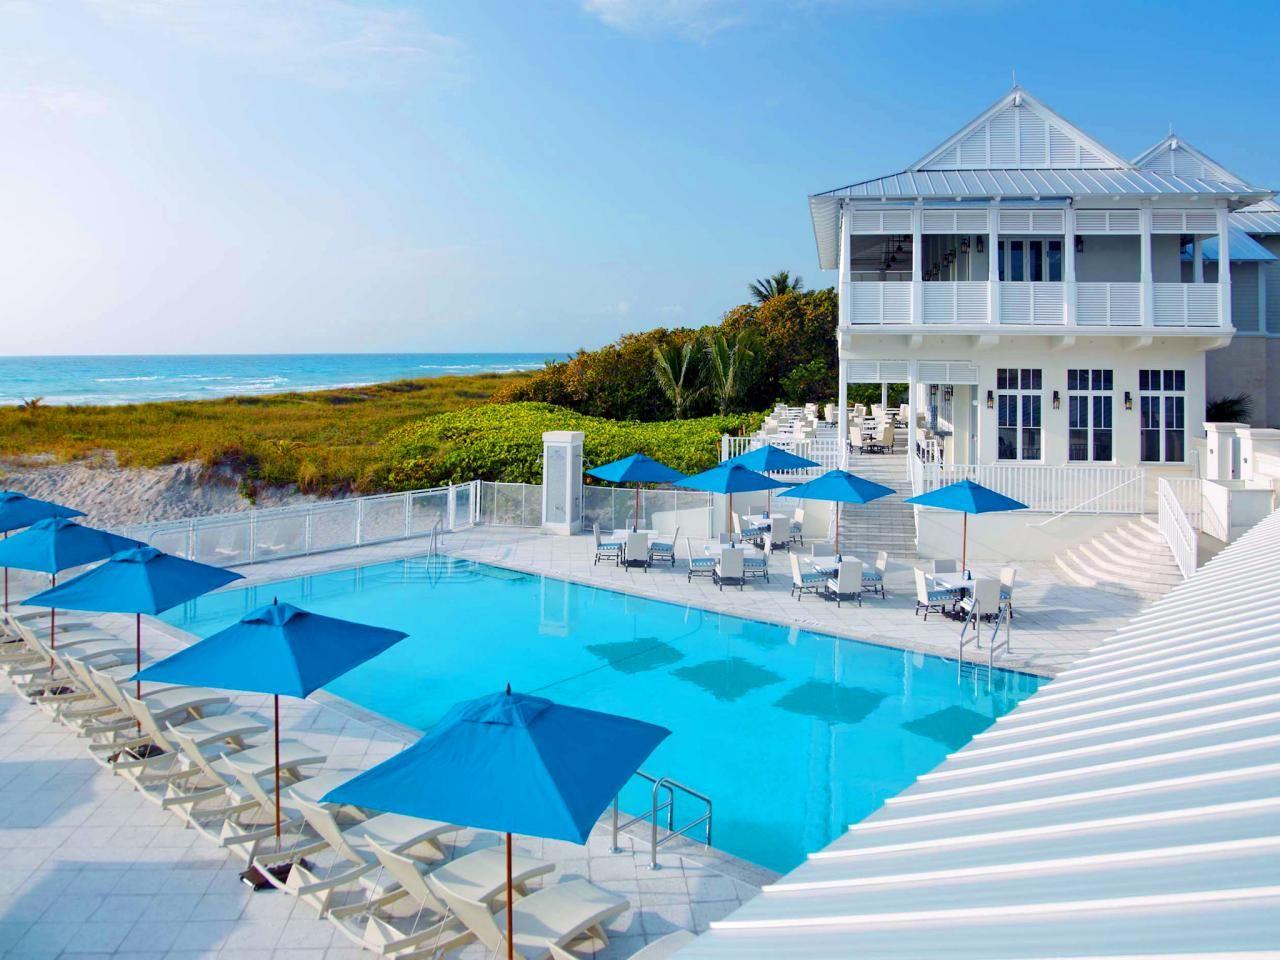 When You Stay At The Seagate Hotel Spa Aren T Just A Delray Beach Floridaflorida Beachesbeach